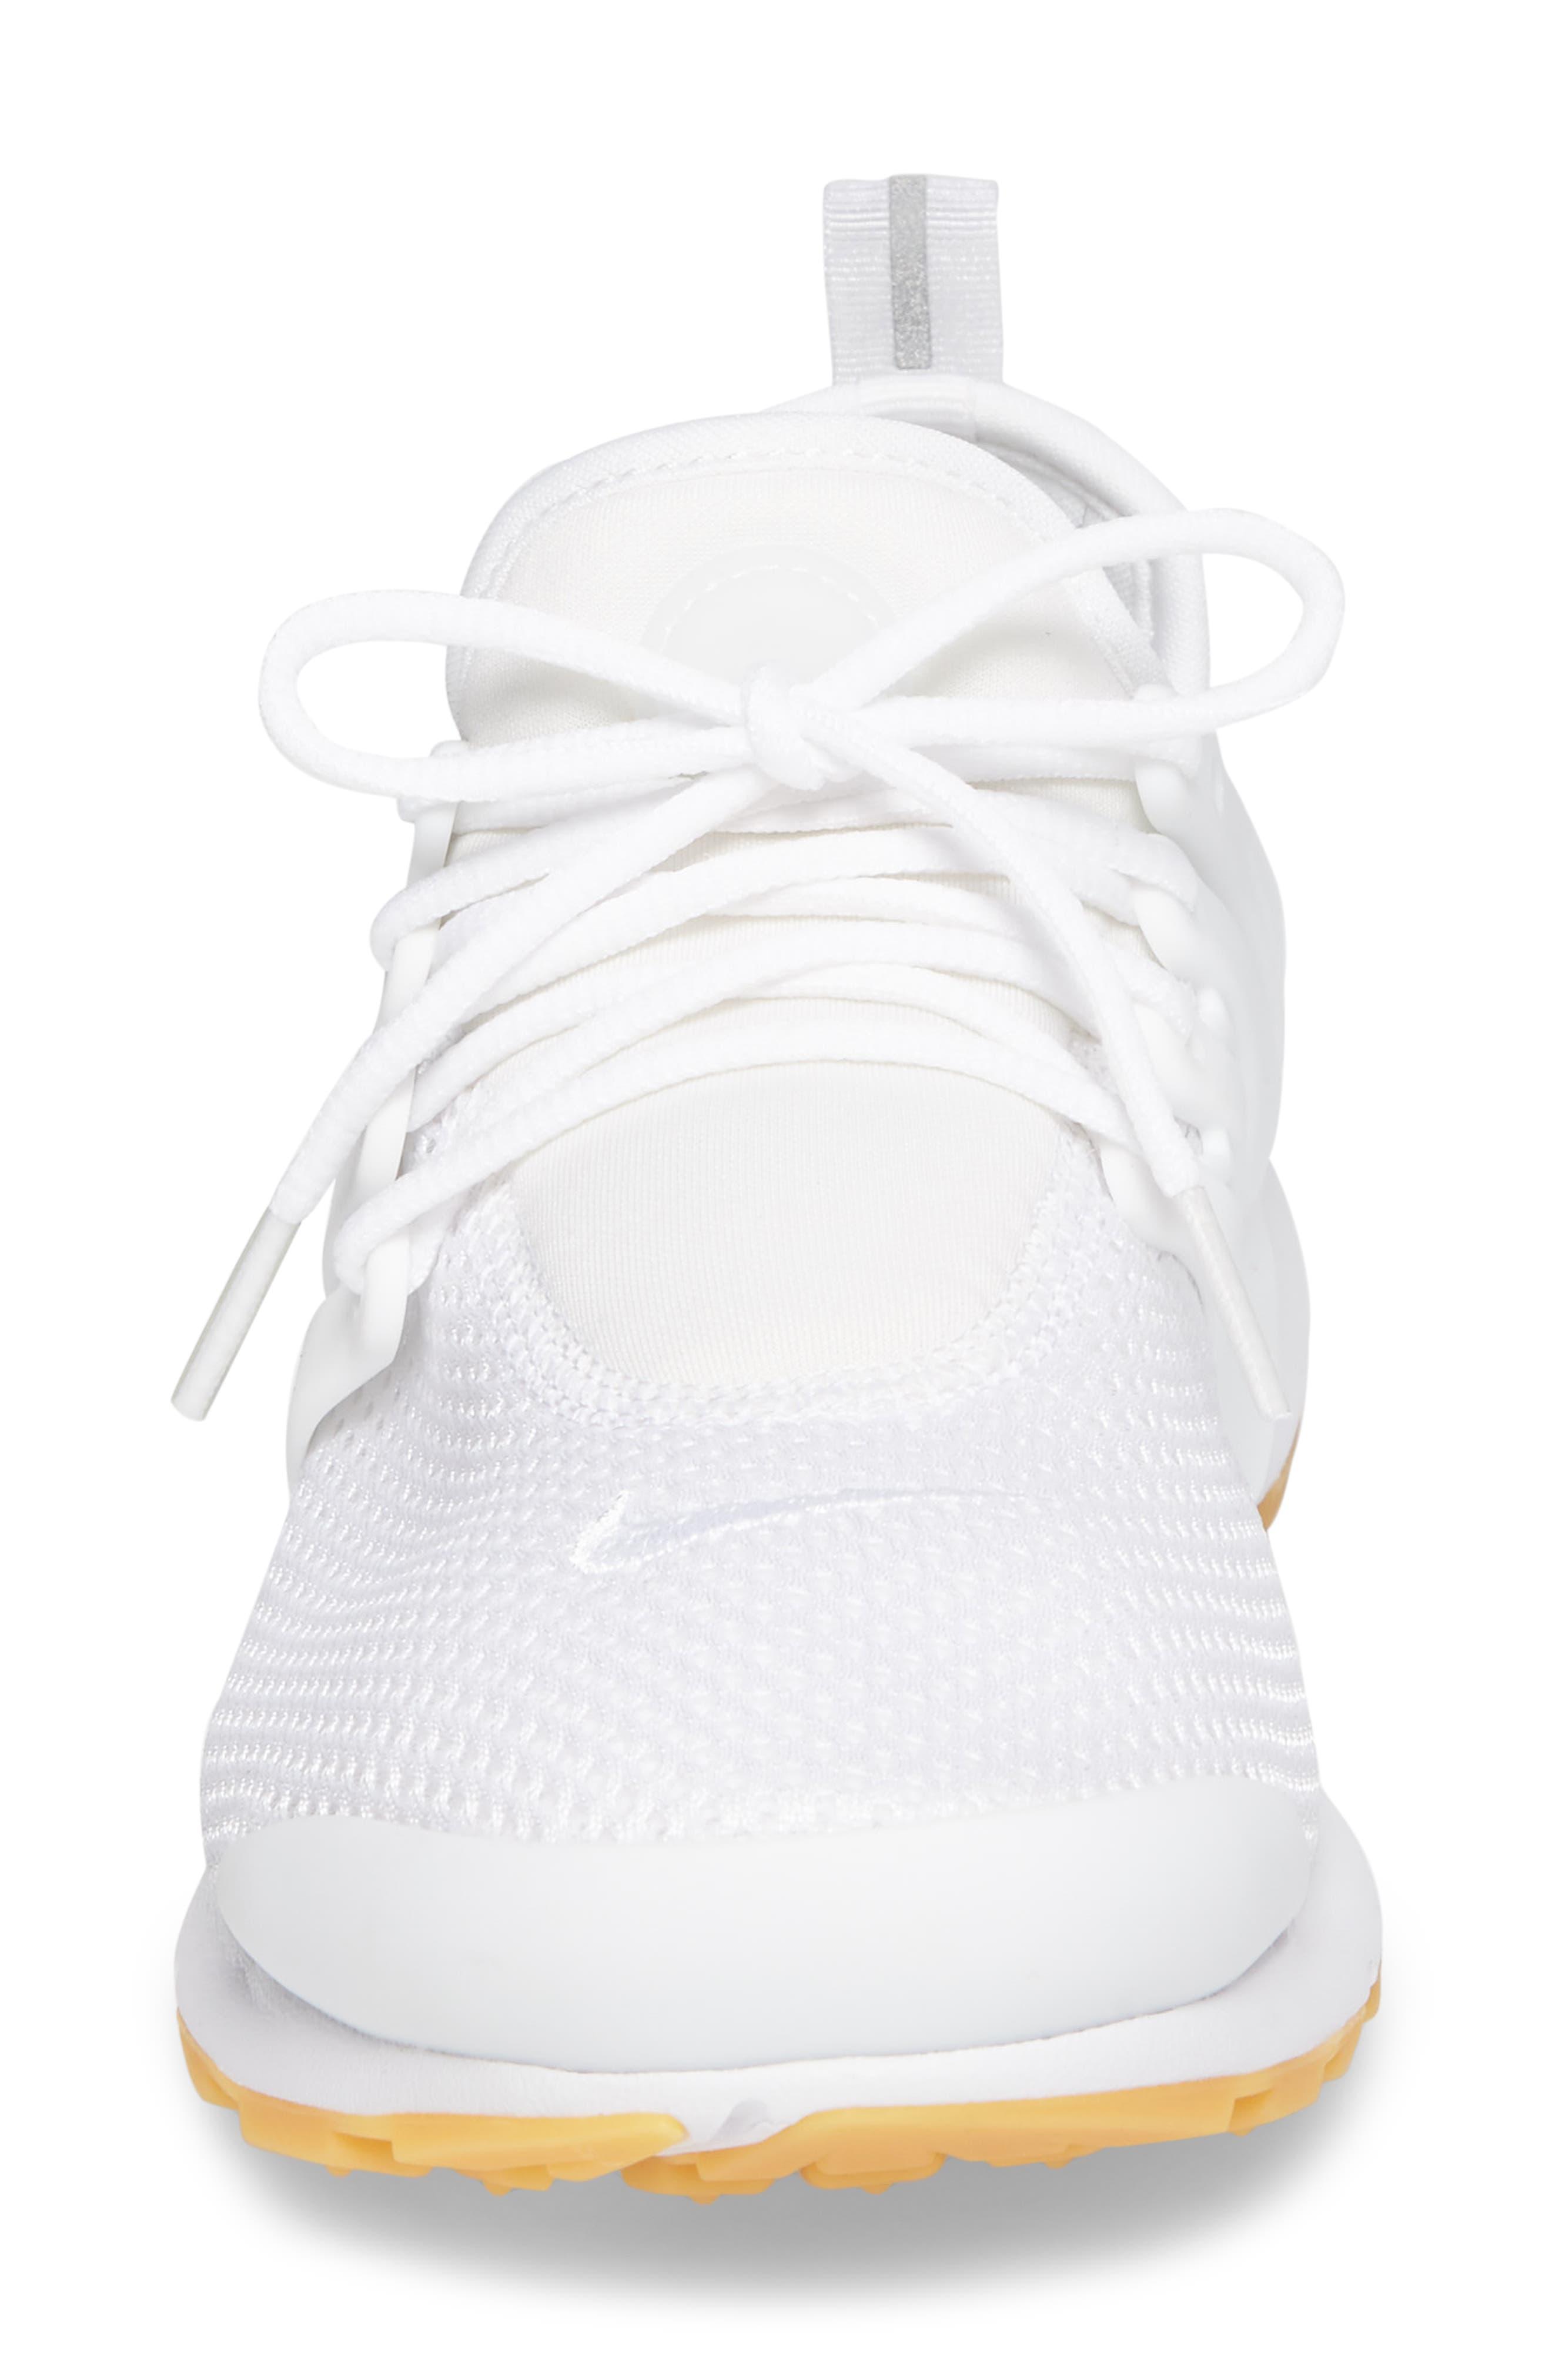 Air Presto Flyknit Ultra Sneaker,                             Alternate thumbnail 4, color,                             White/ Gum Yellow/ Wolf Grey